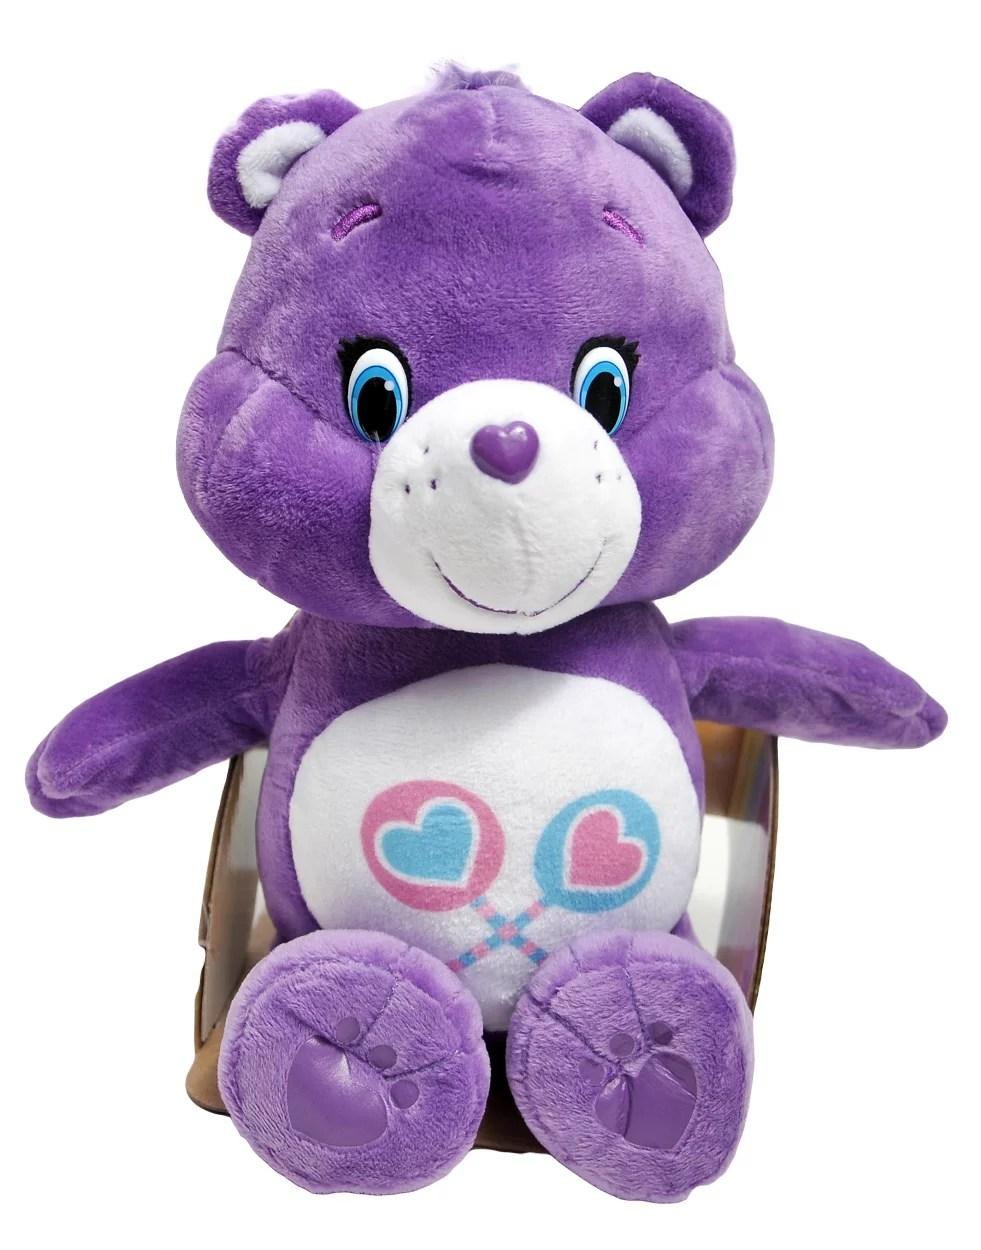 Care Bears Soft Plush Share Bear 11